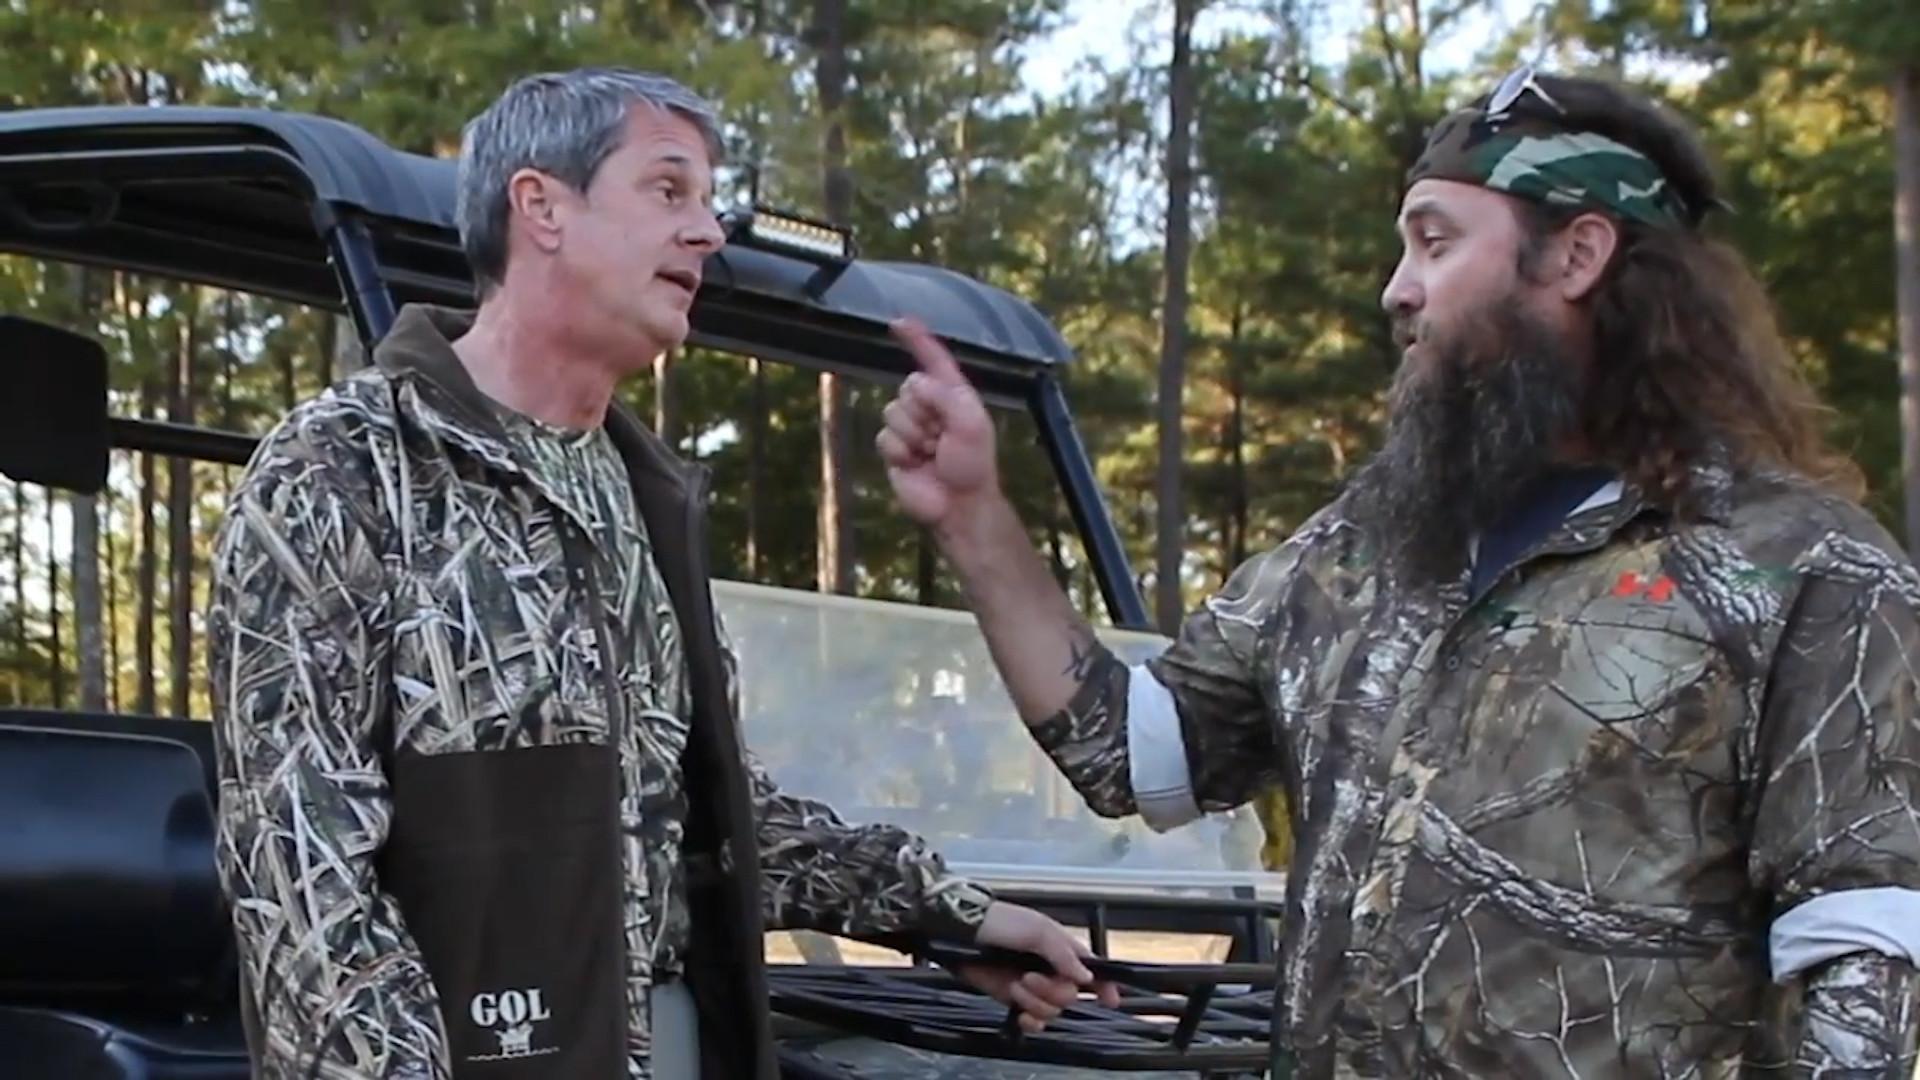 Res: 1920x1080, Louisiana 2016 gubernatorial campaign: David Vitter ad stars Duck Dynasty's  Willie Robertson - POLITICO